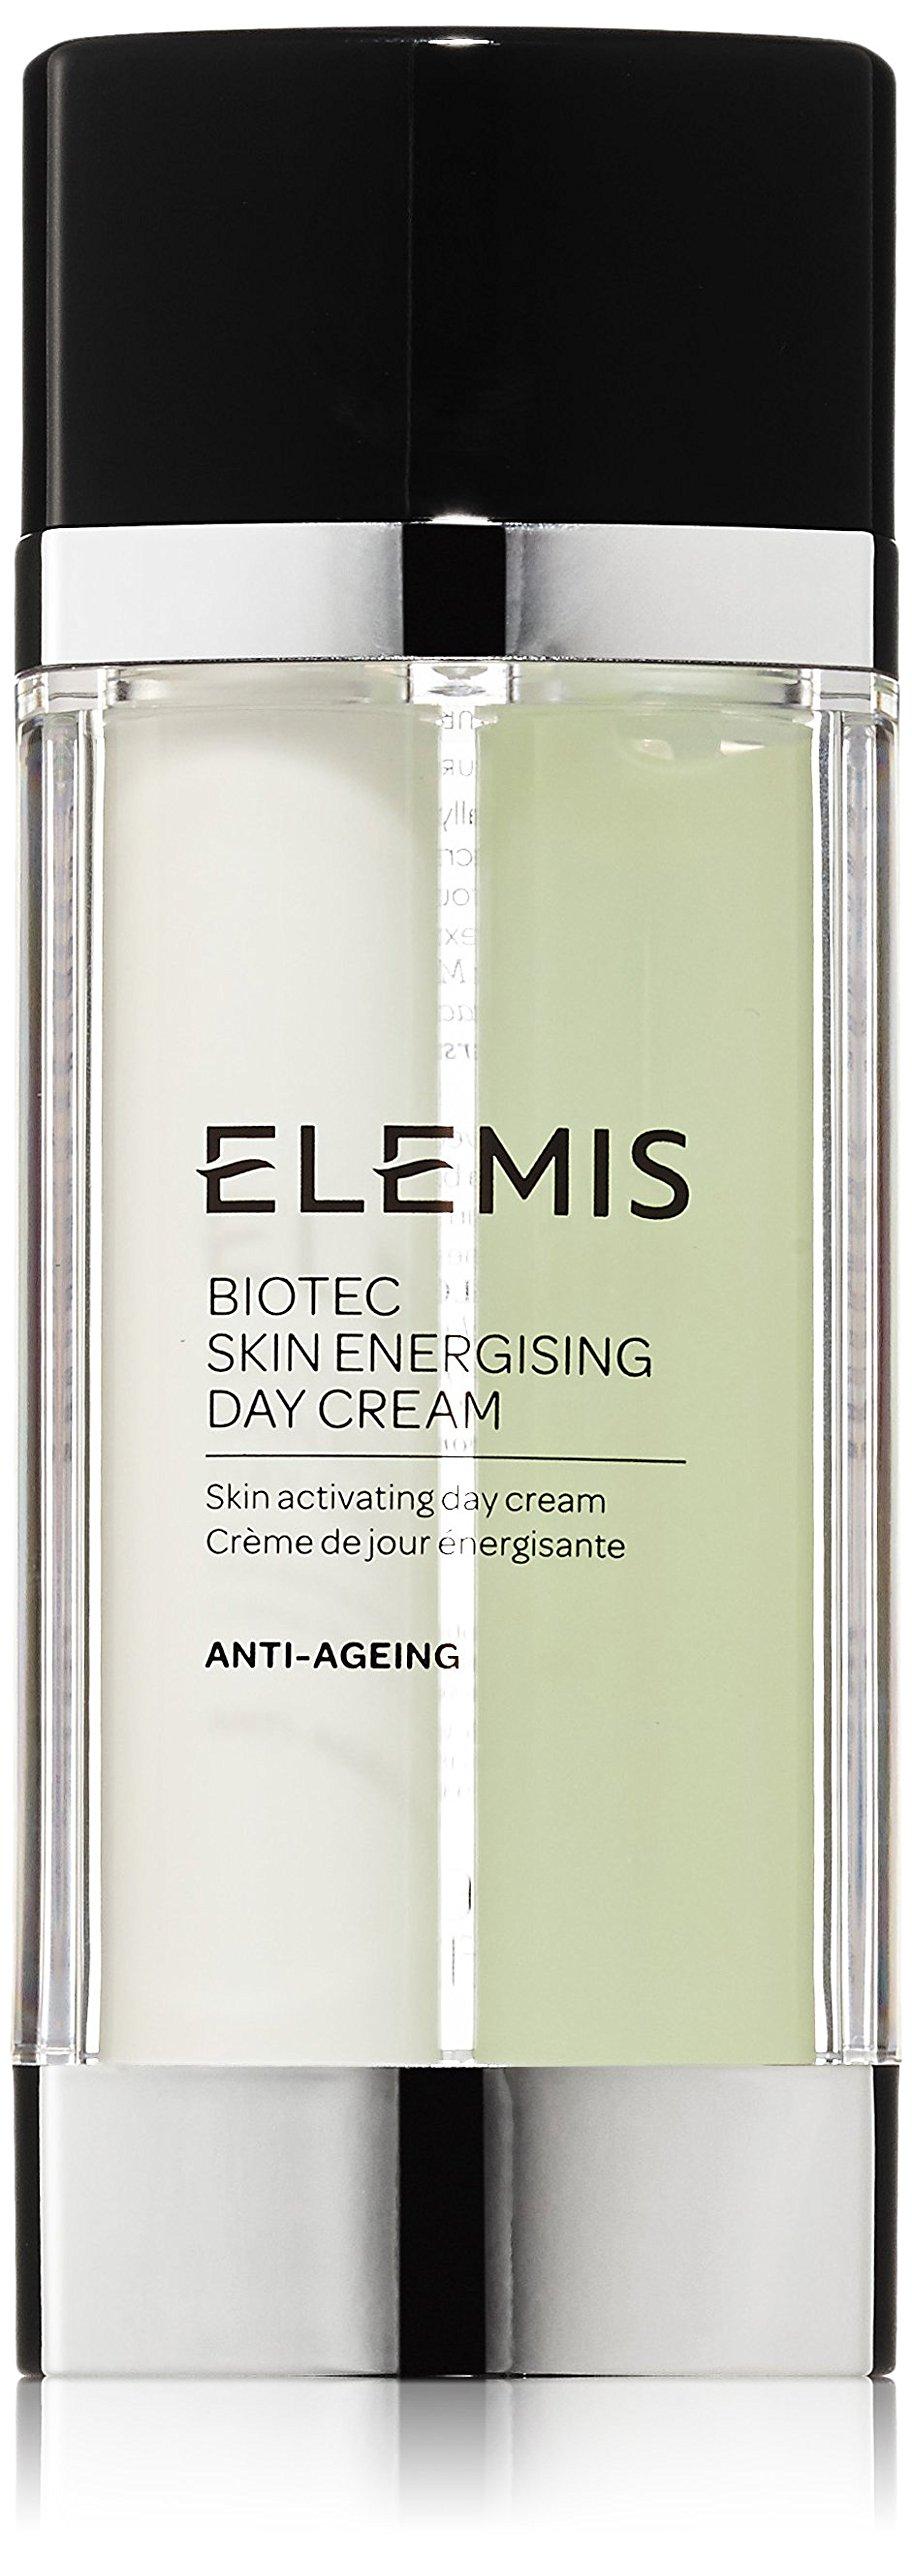 ELEMIS BIOTEC Skin Energizing Day Cream, Skin Activating Moisturizer for Normal Skin, 1 fl. oz.